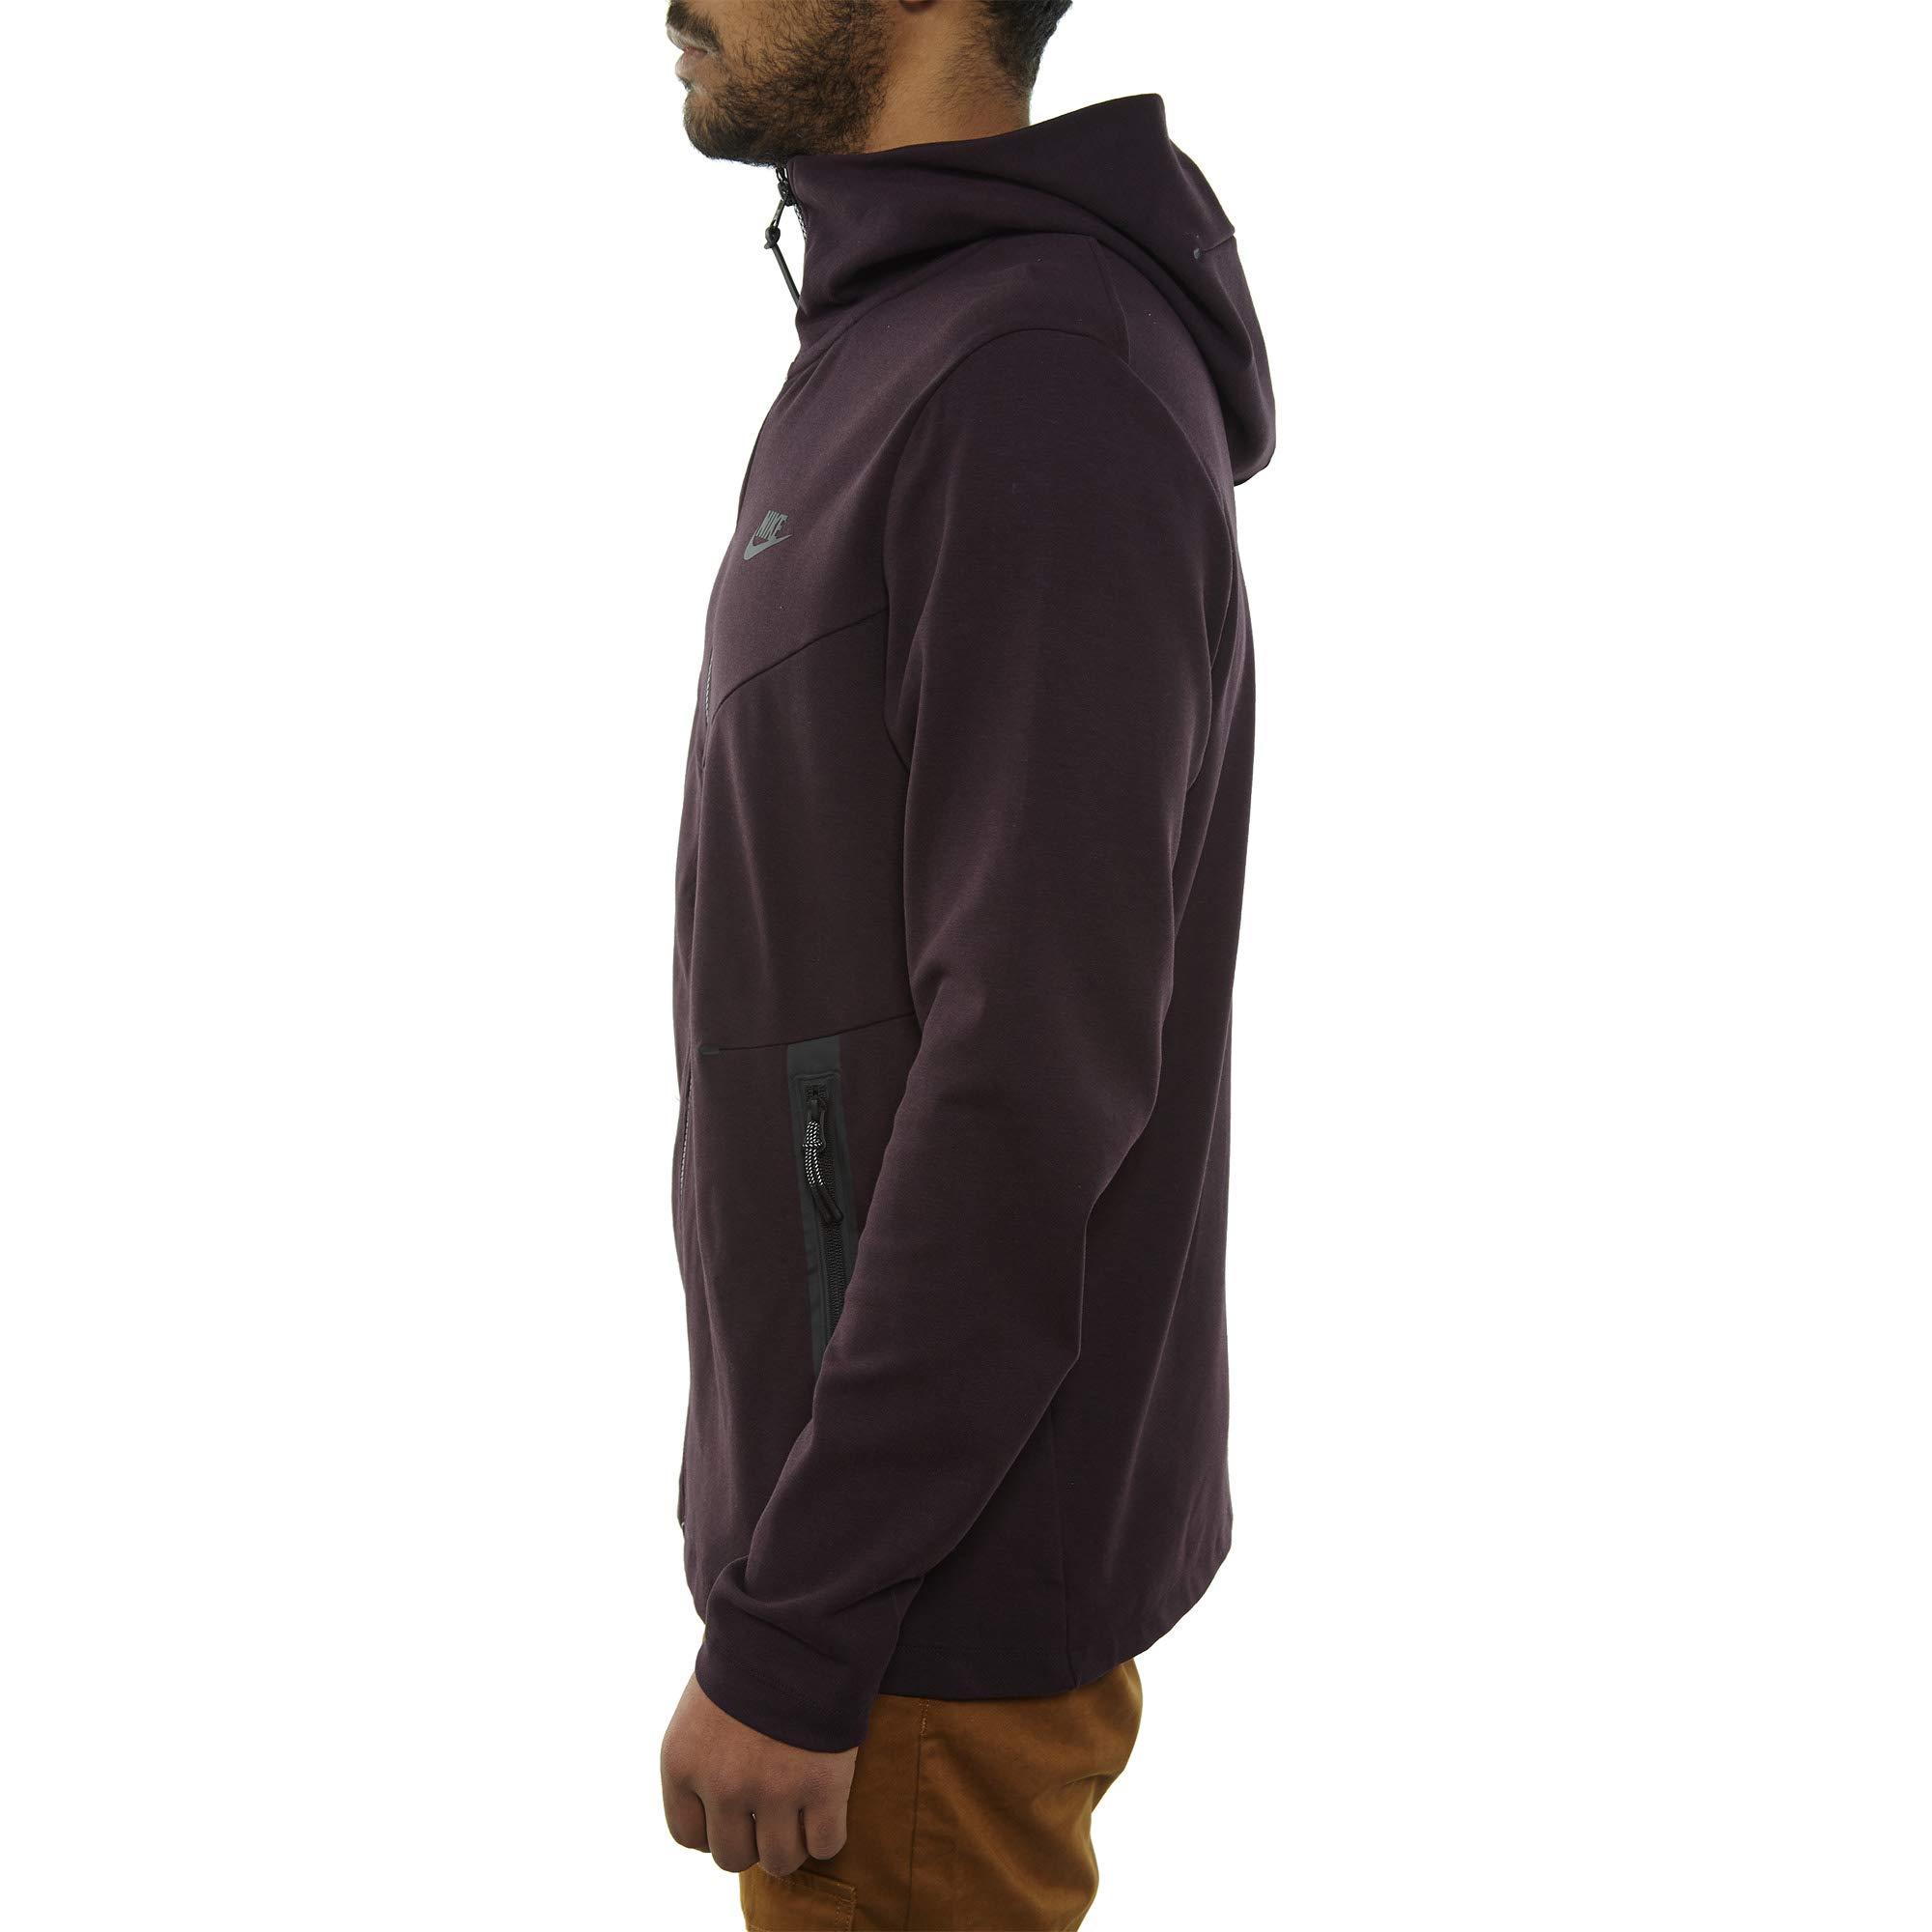 Nike Mens Tech Fleece Pack Full Zip Training Hoodie Burgundy Ash/Black AA3784-659 Size Small by Nike (Image #3)